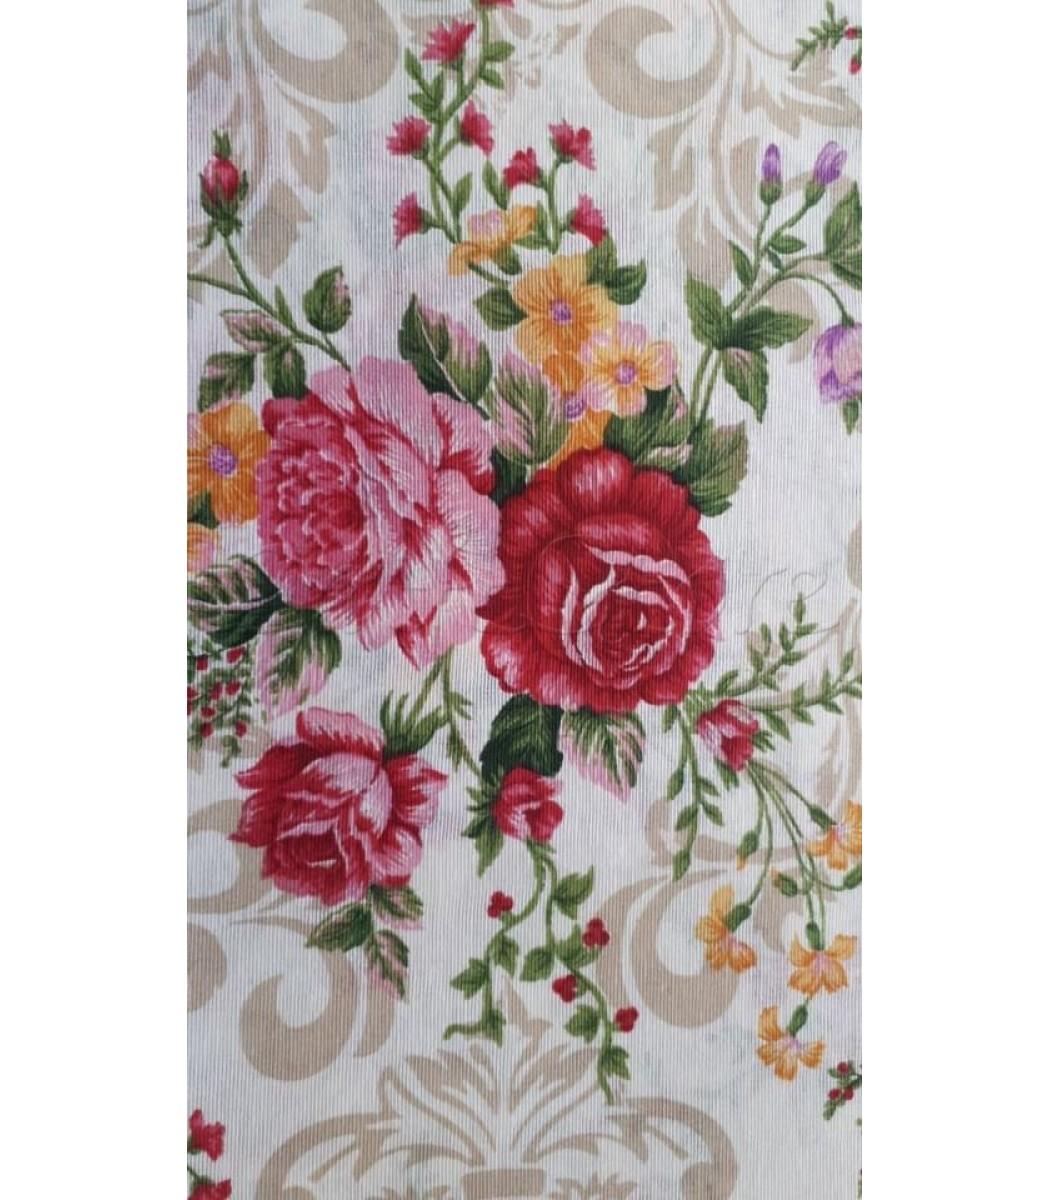 435543d9795c Λονέτα με σχέδιο Vintage Floral Φούξια-Μουστρδί-Μωβ 40εκ. x 1μ ...